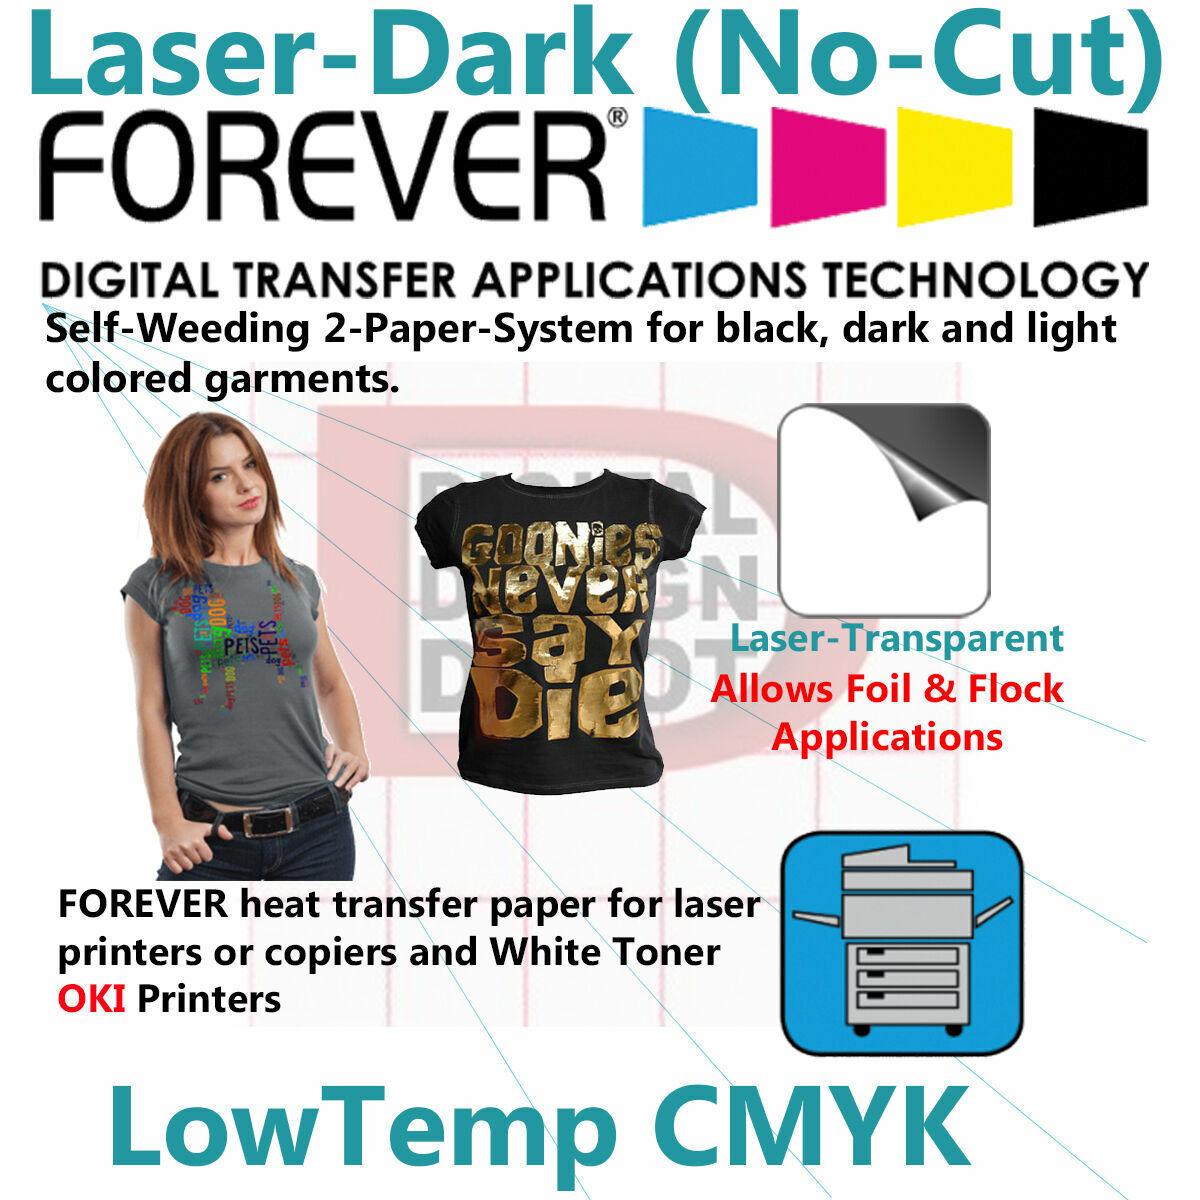 Forever Laser Dark NoCut A+B-PAPER Heat Transfer PAPER OKI P